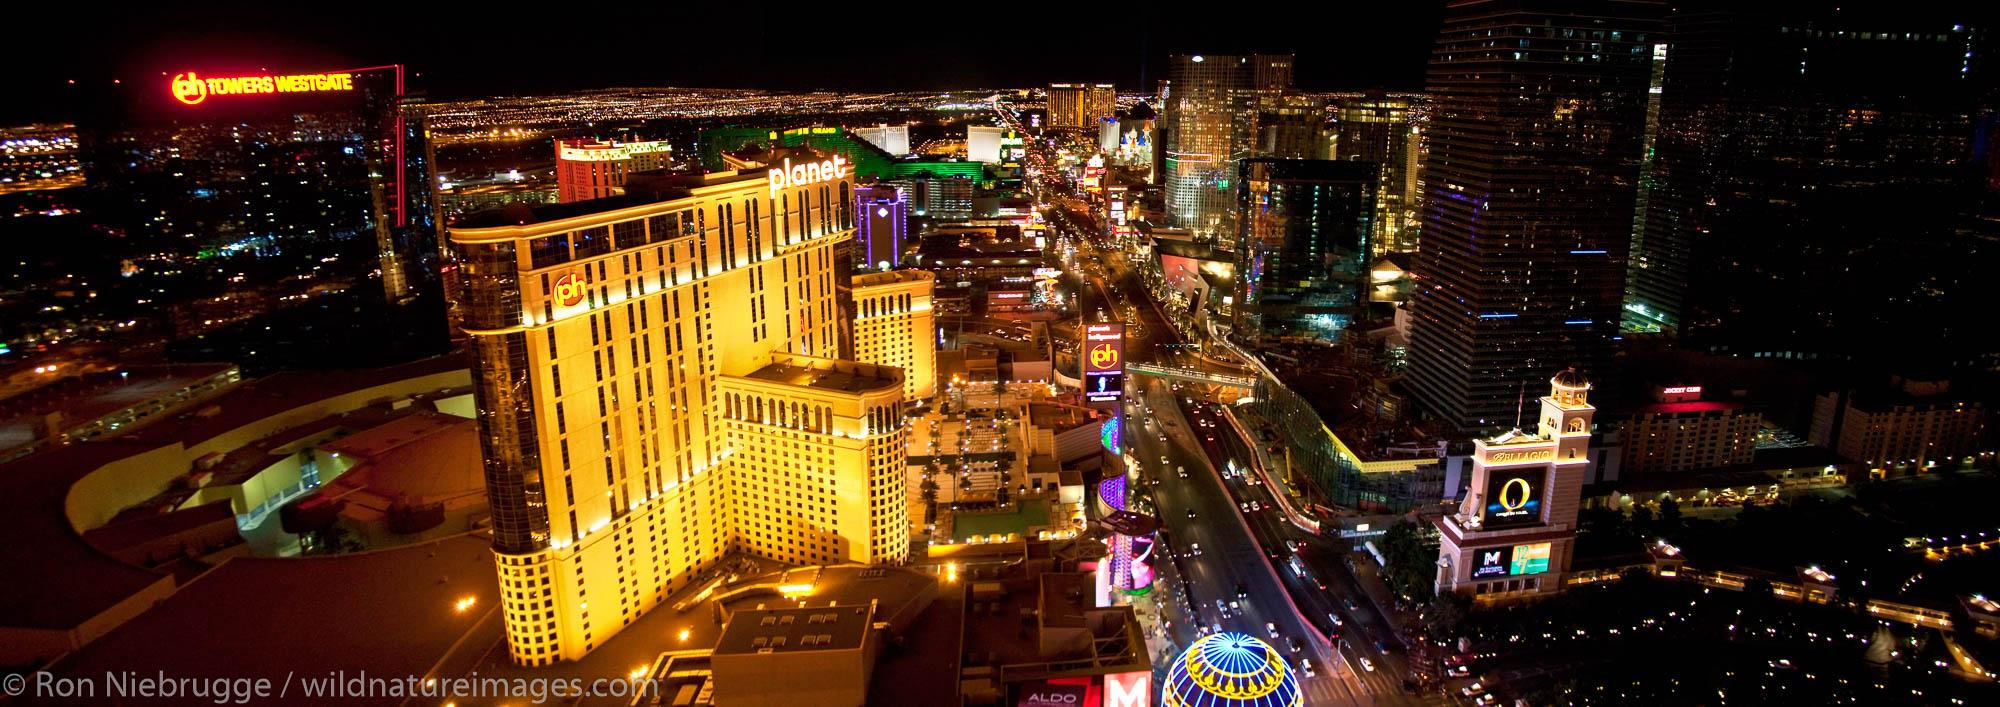 Panoramic of Las Vegas Strip at night.  Las Vegas, NV